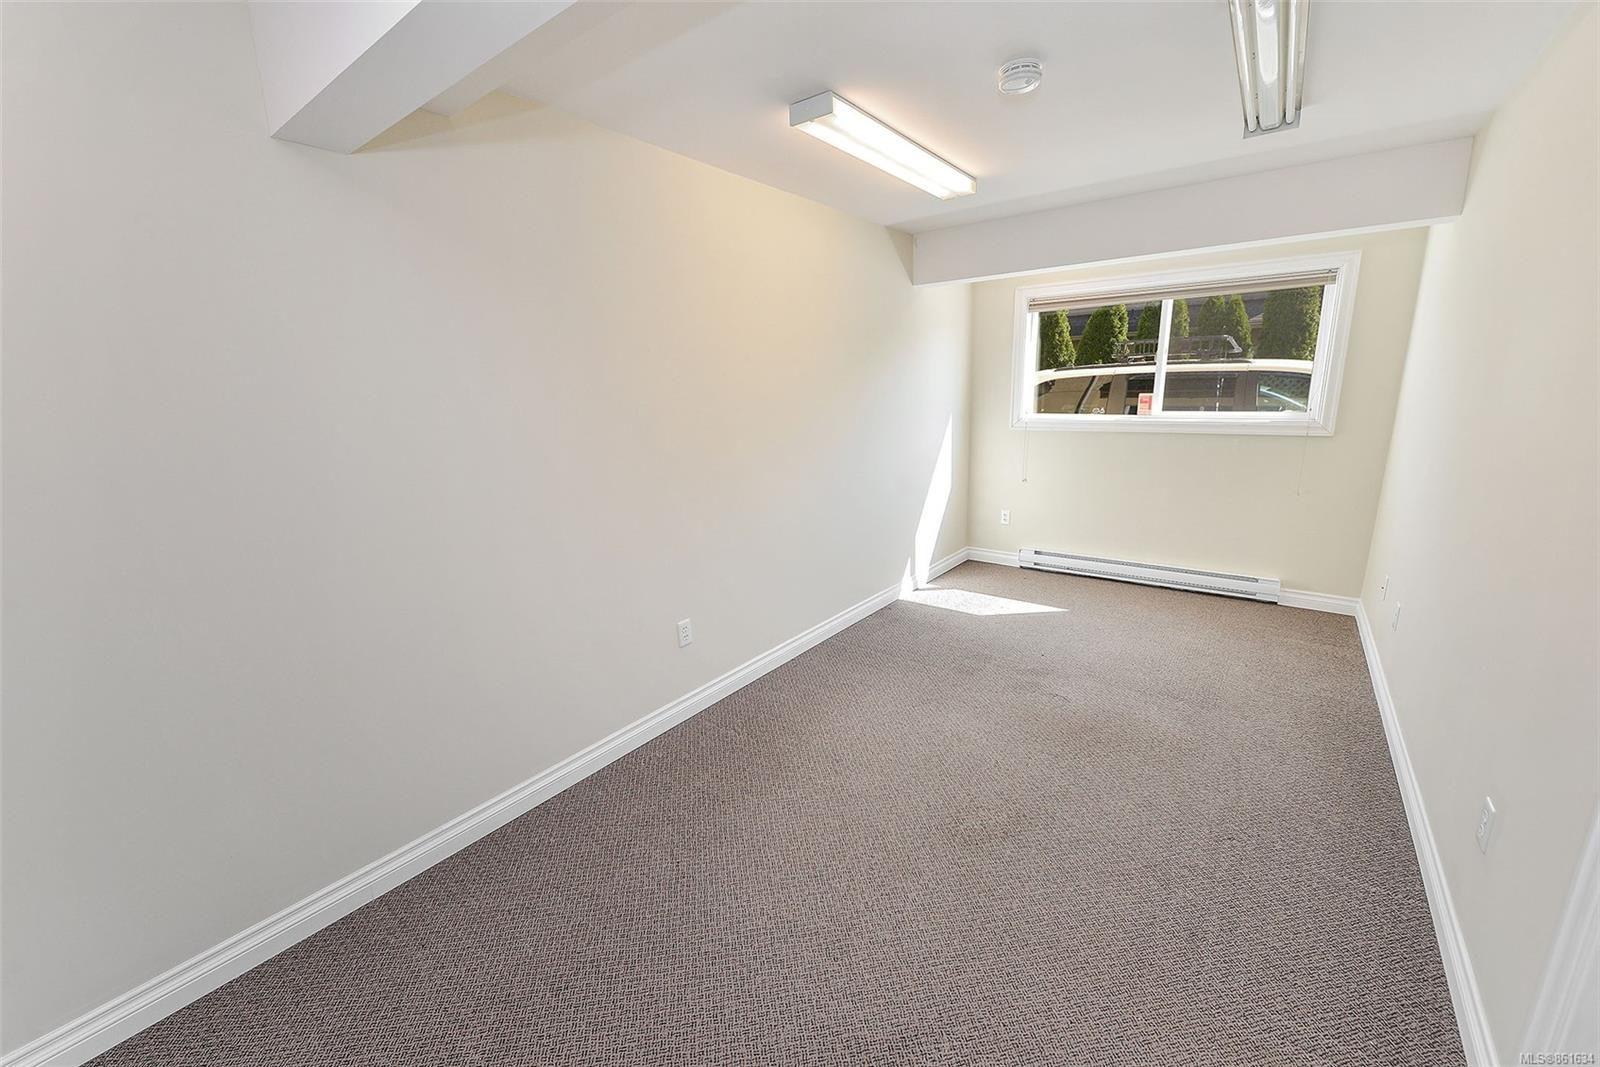 Photo 7: Photos: 367 E Burnside Rd in : Vi Burnside Quadruplex for sale (Victoria)  : MLS®# 861634